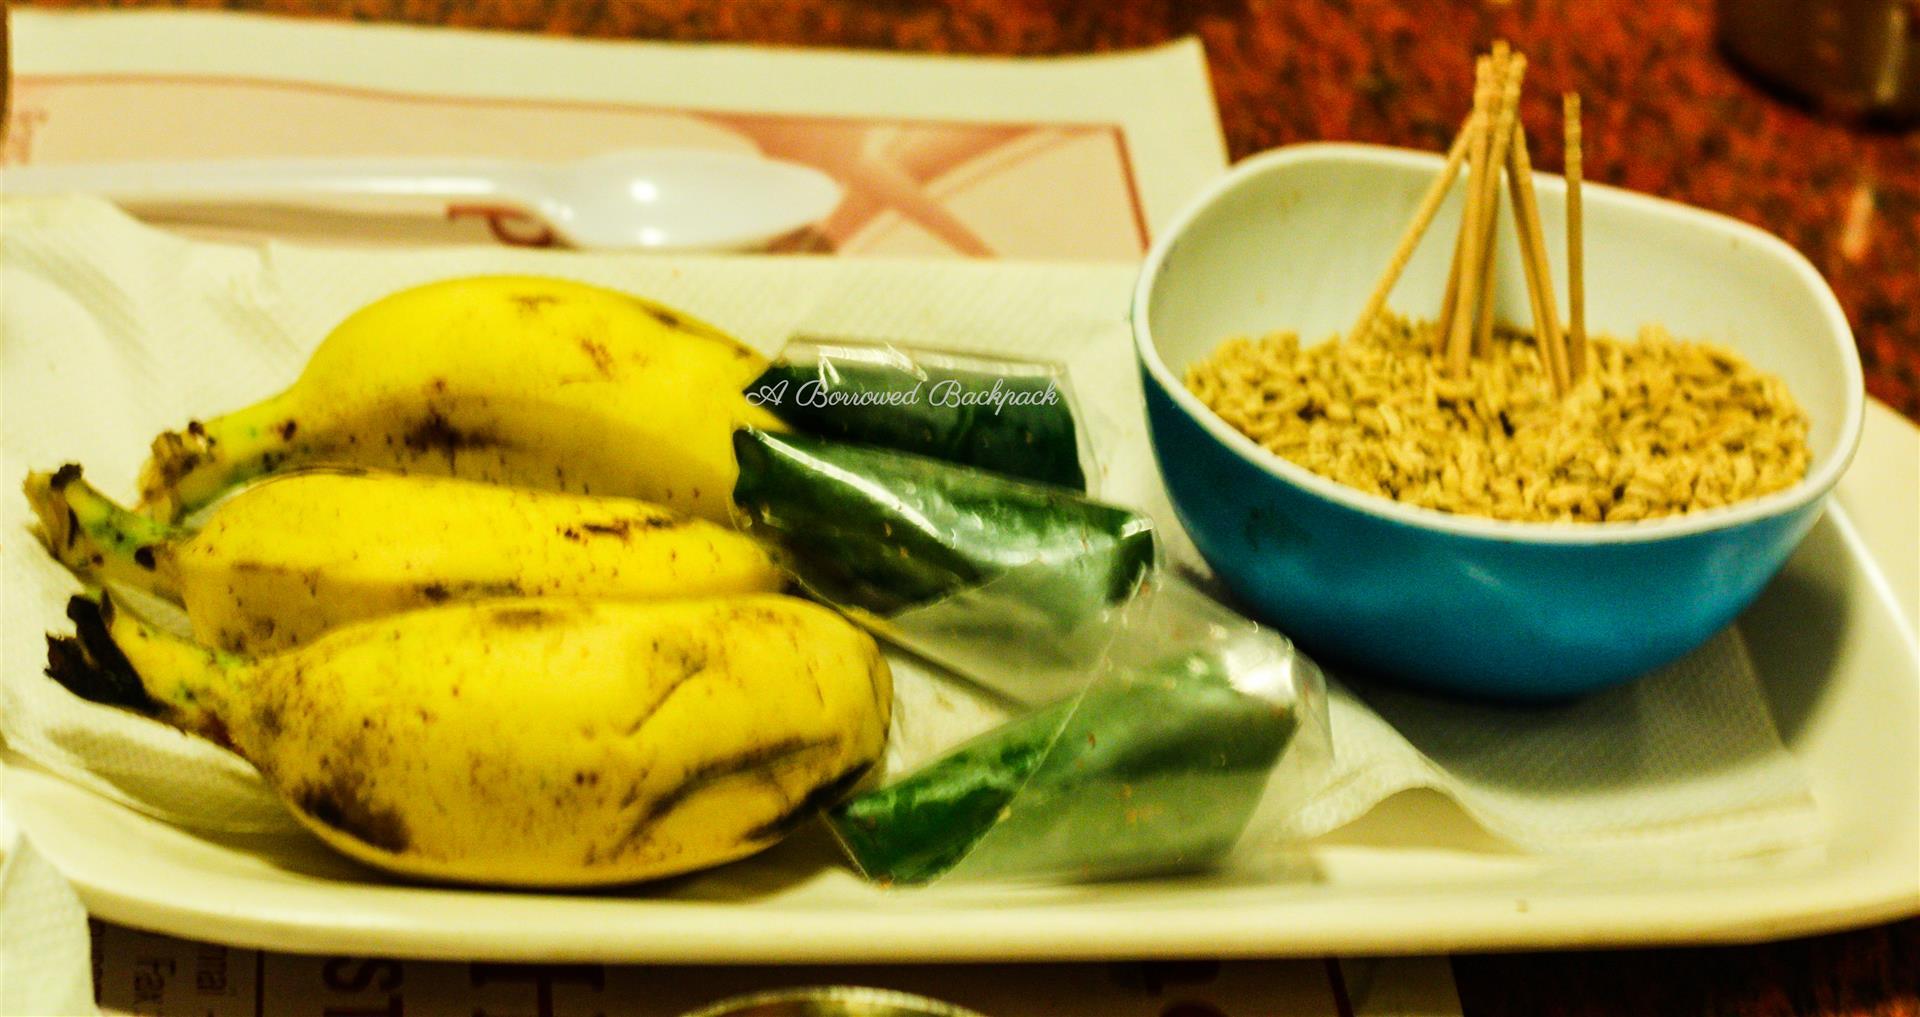 south indian banana (Large)